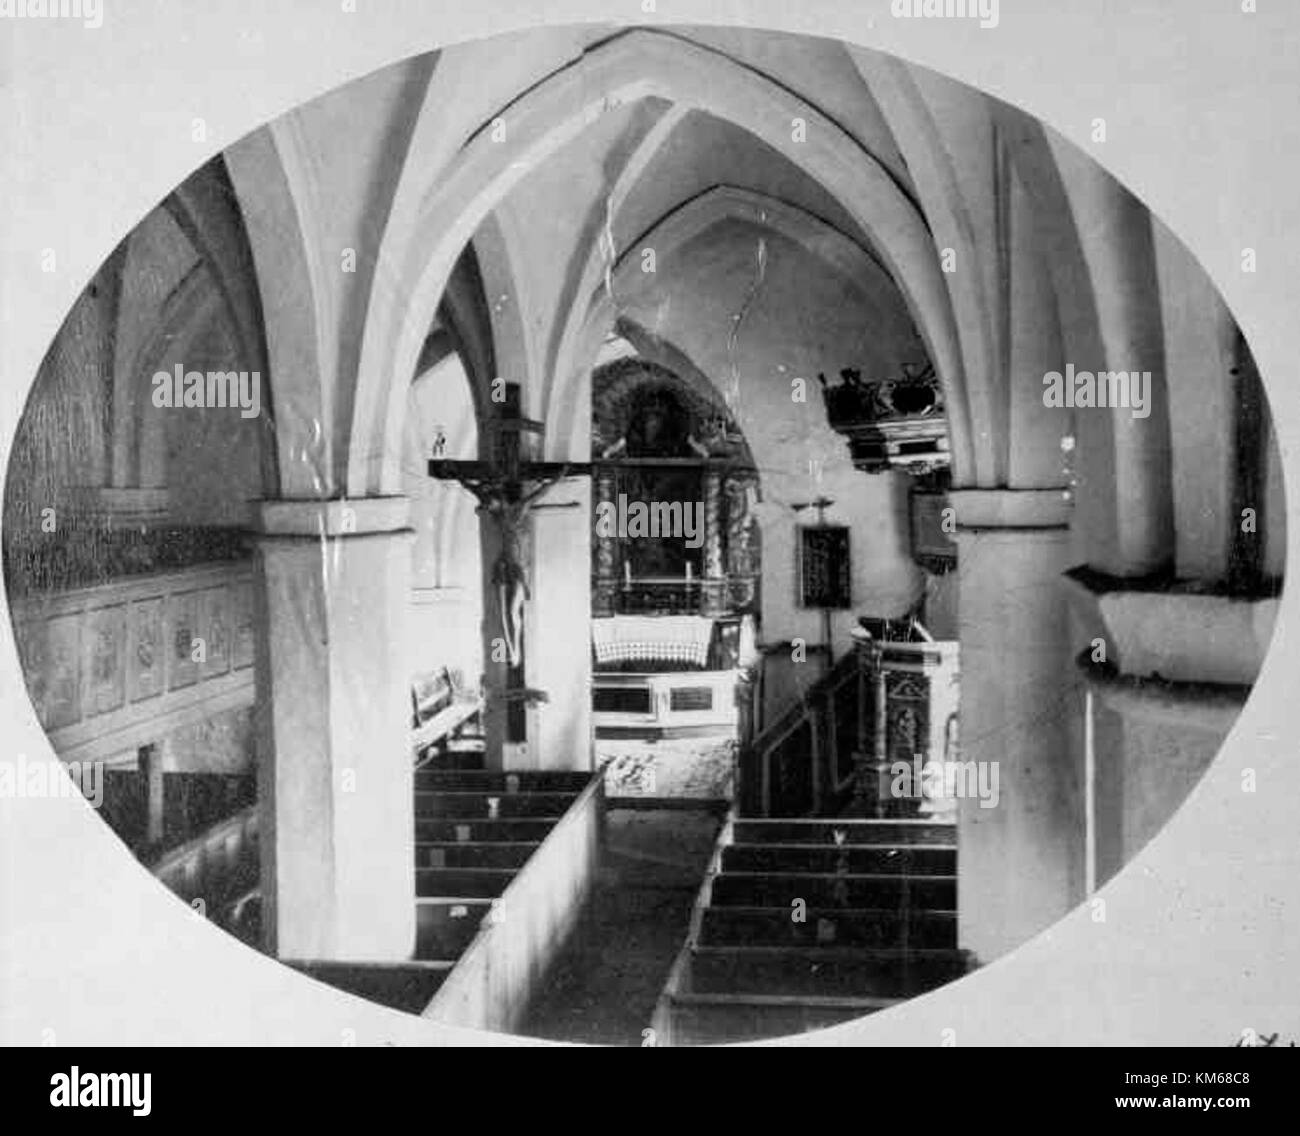 Wallenbergs prstgrd - Norra Mellby Prstgrd & Spa